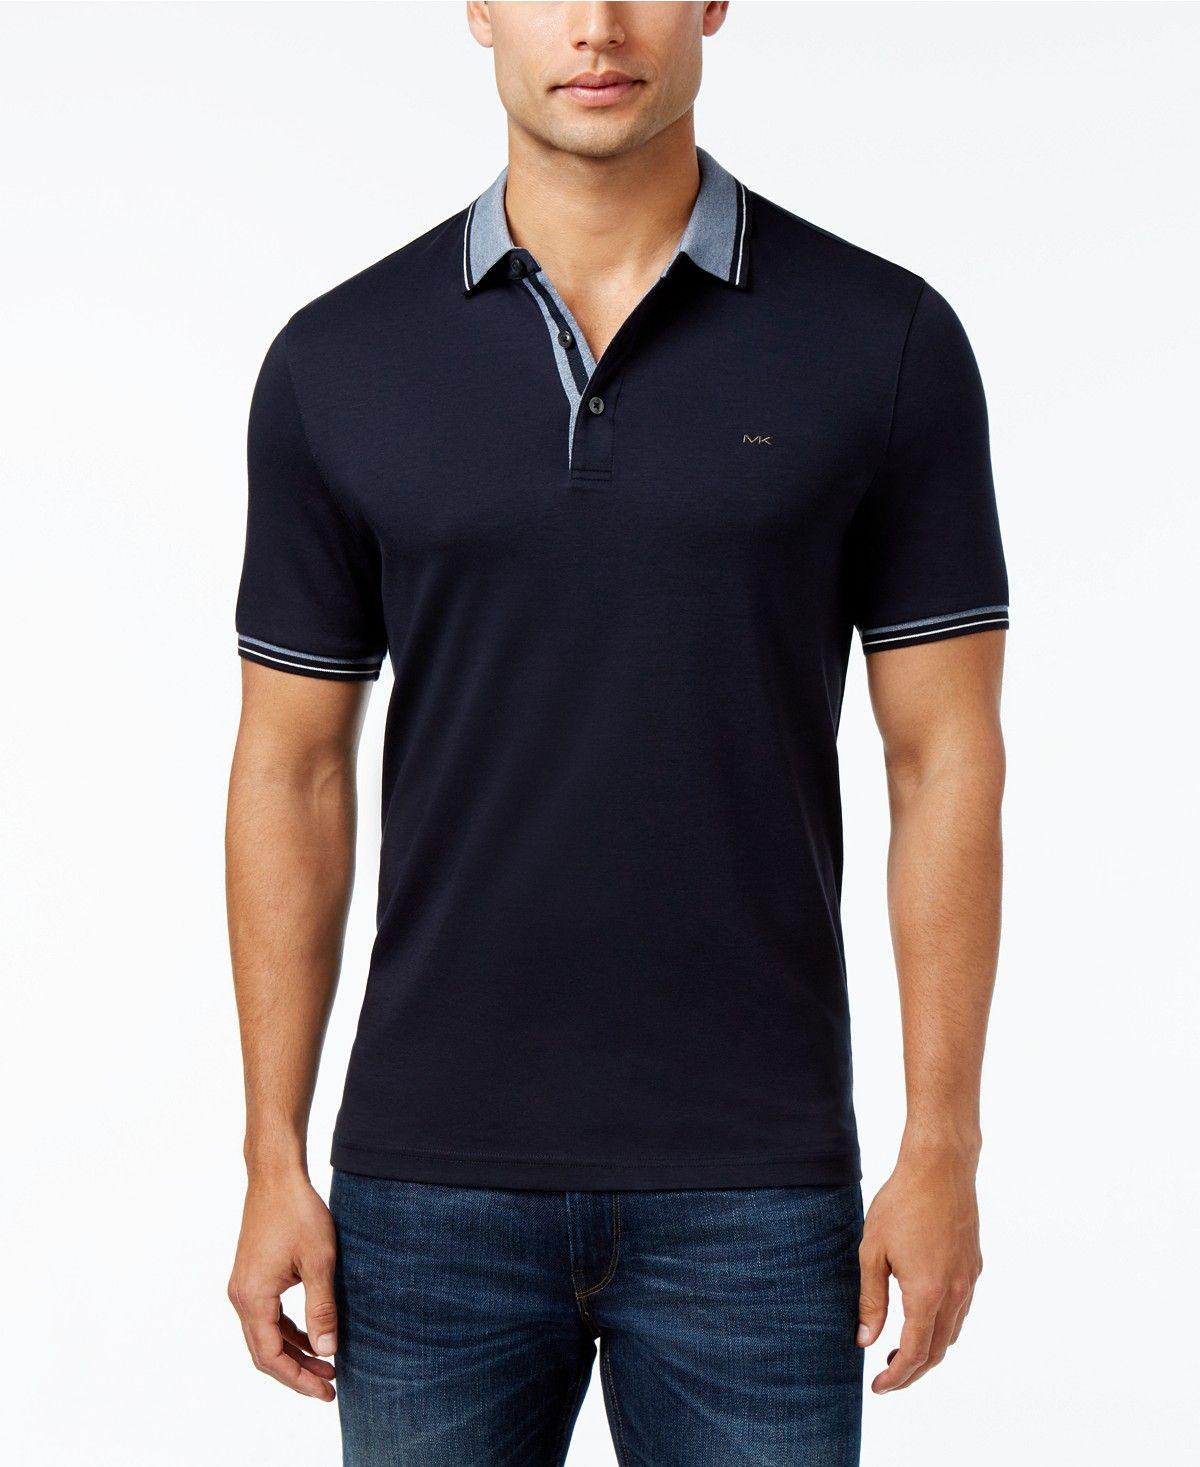 07795228c Michael Kors Men's Liquid Cotton Greenwich Polo Shirt - Polos - Men - Macy's